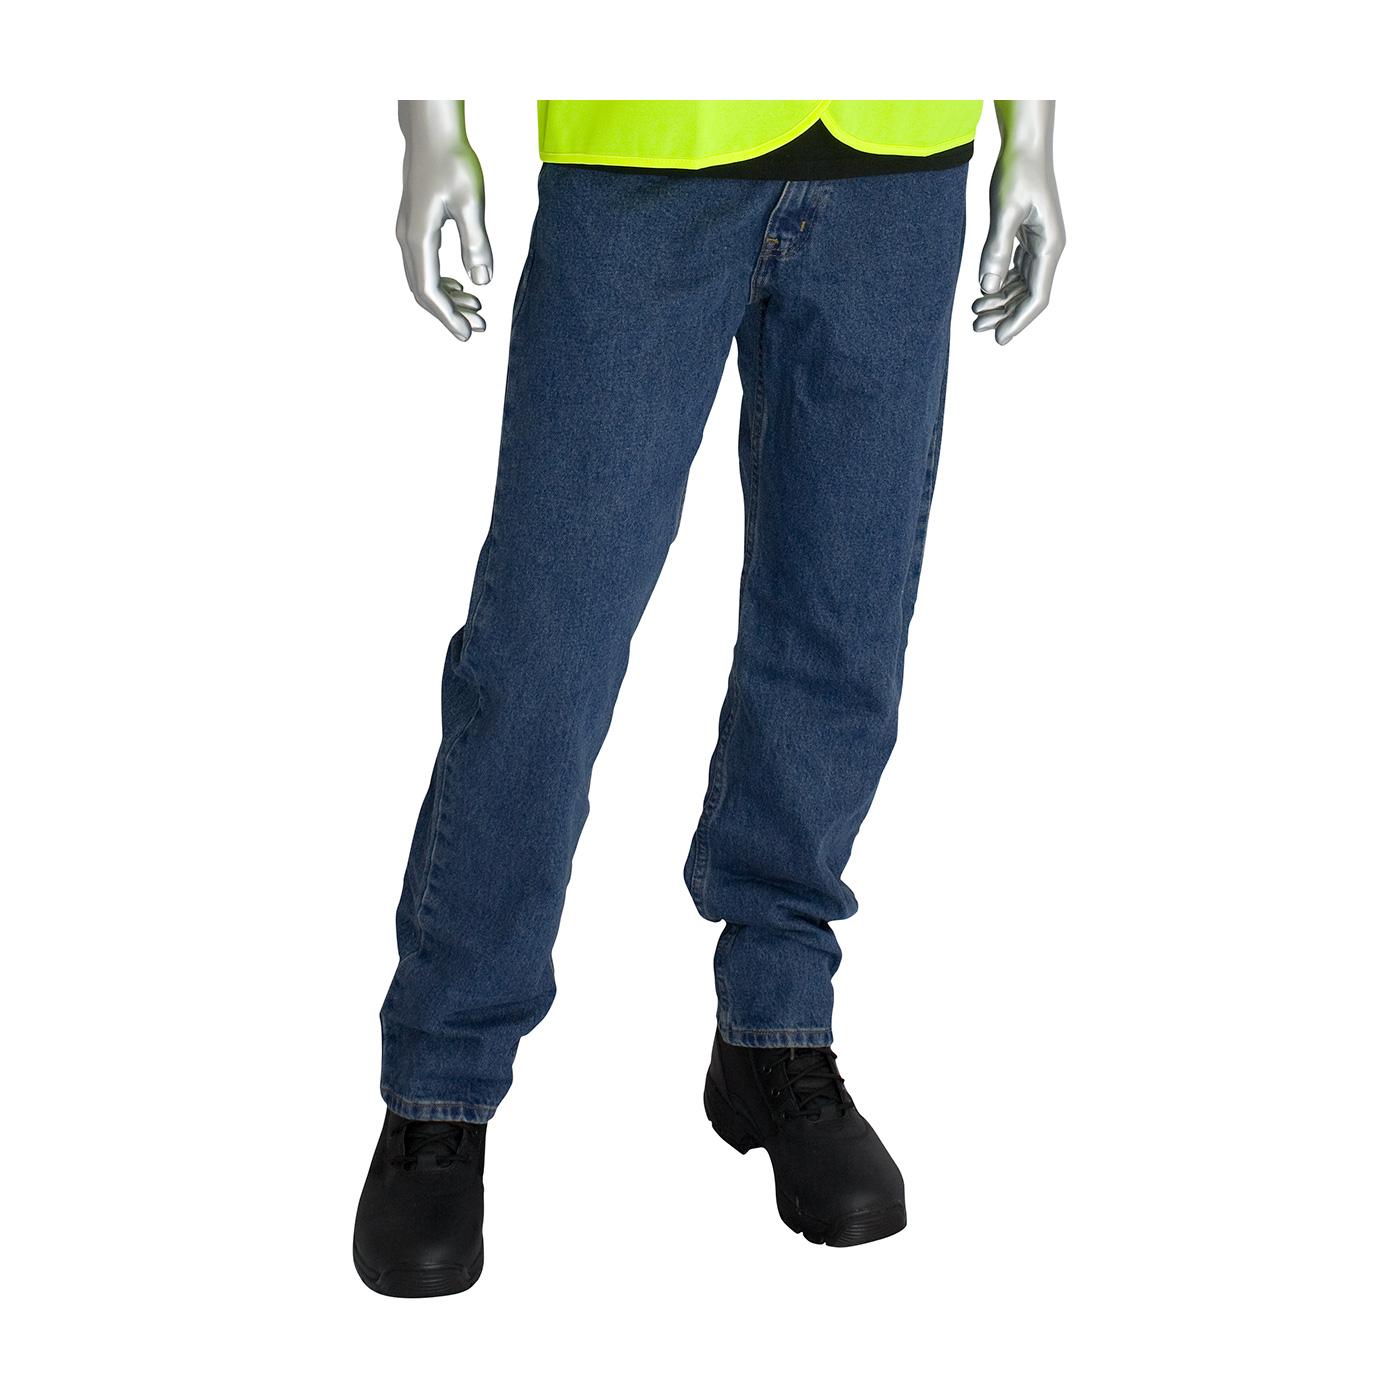 AR/FR Dual Certified Jeans - 16.4 cal/cm2, Blue, 38W x 36L